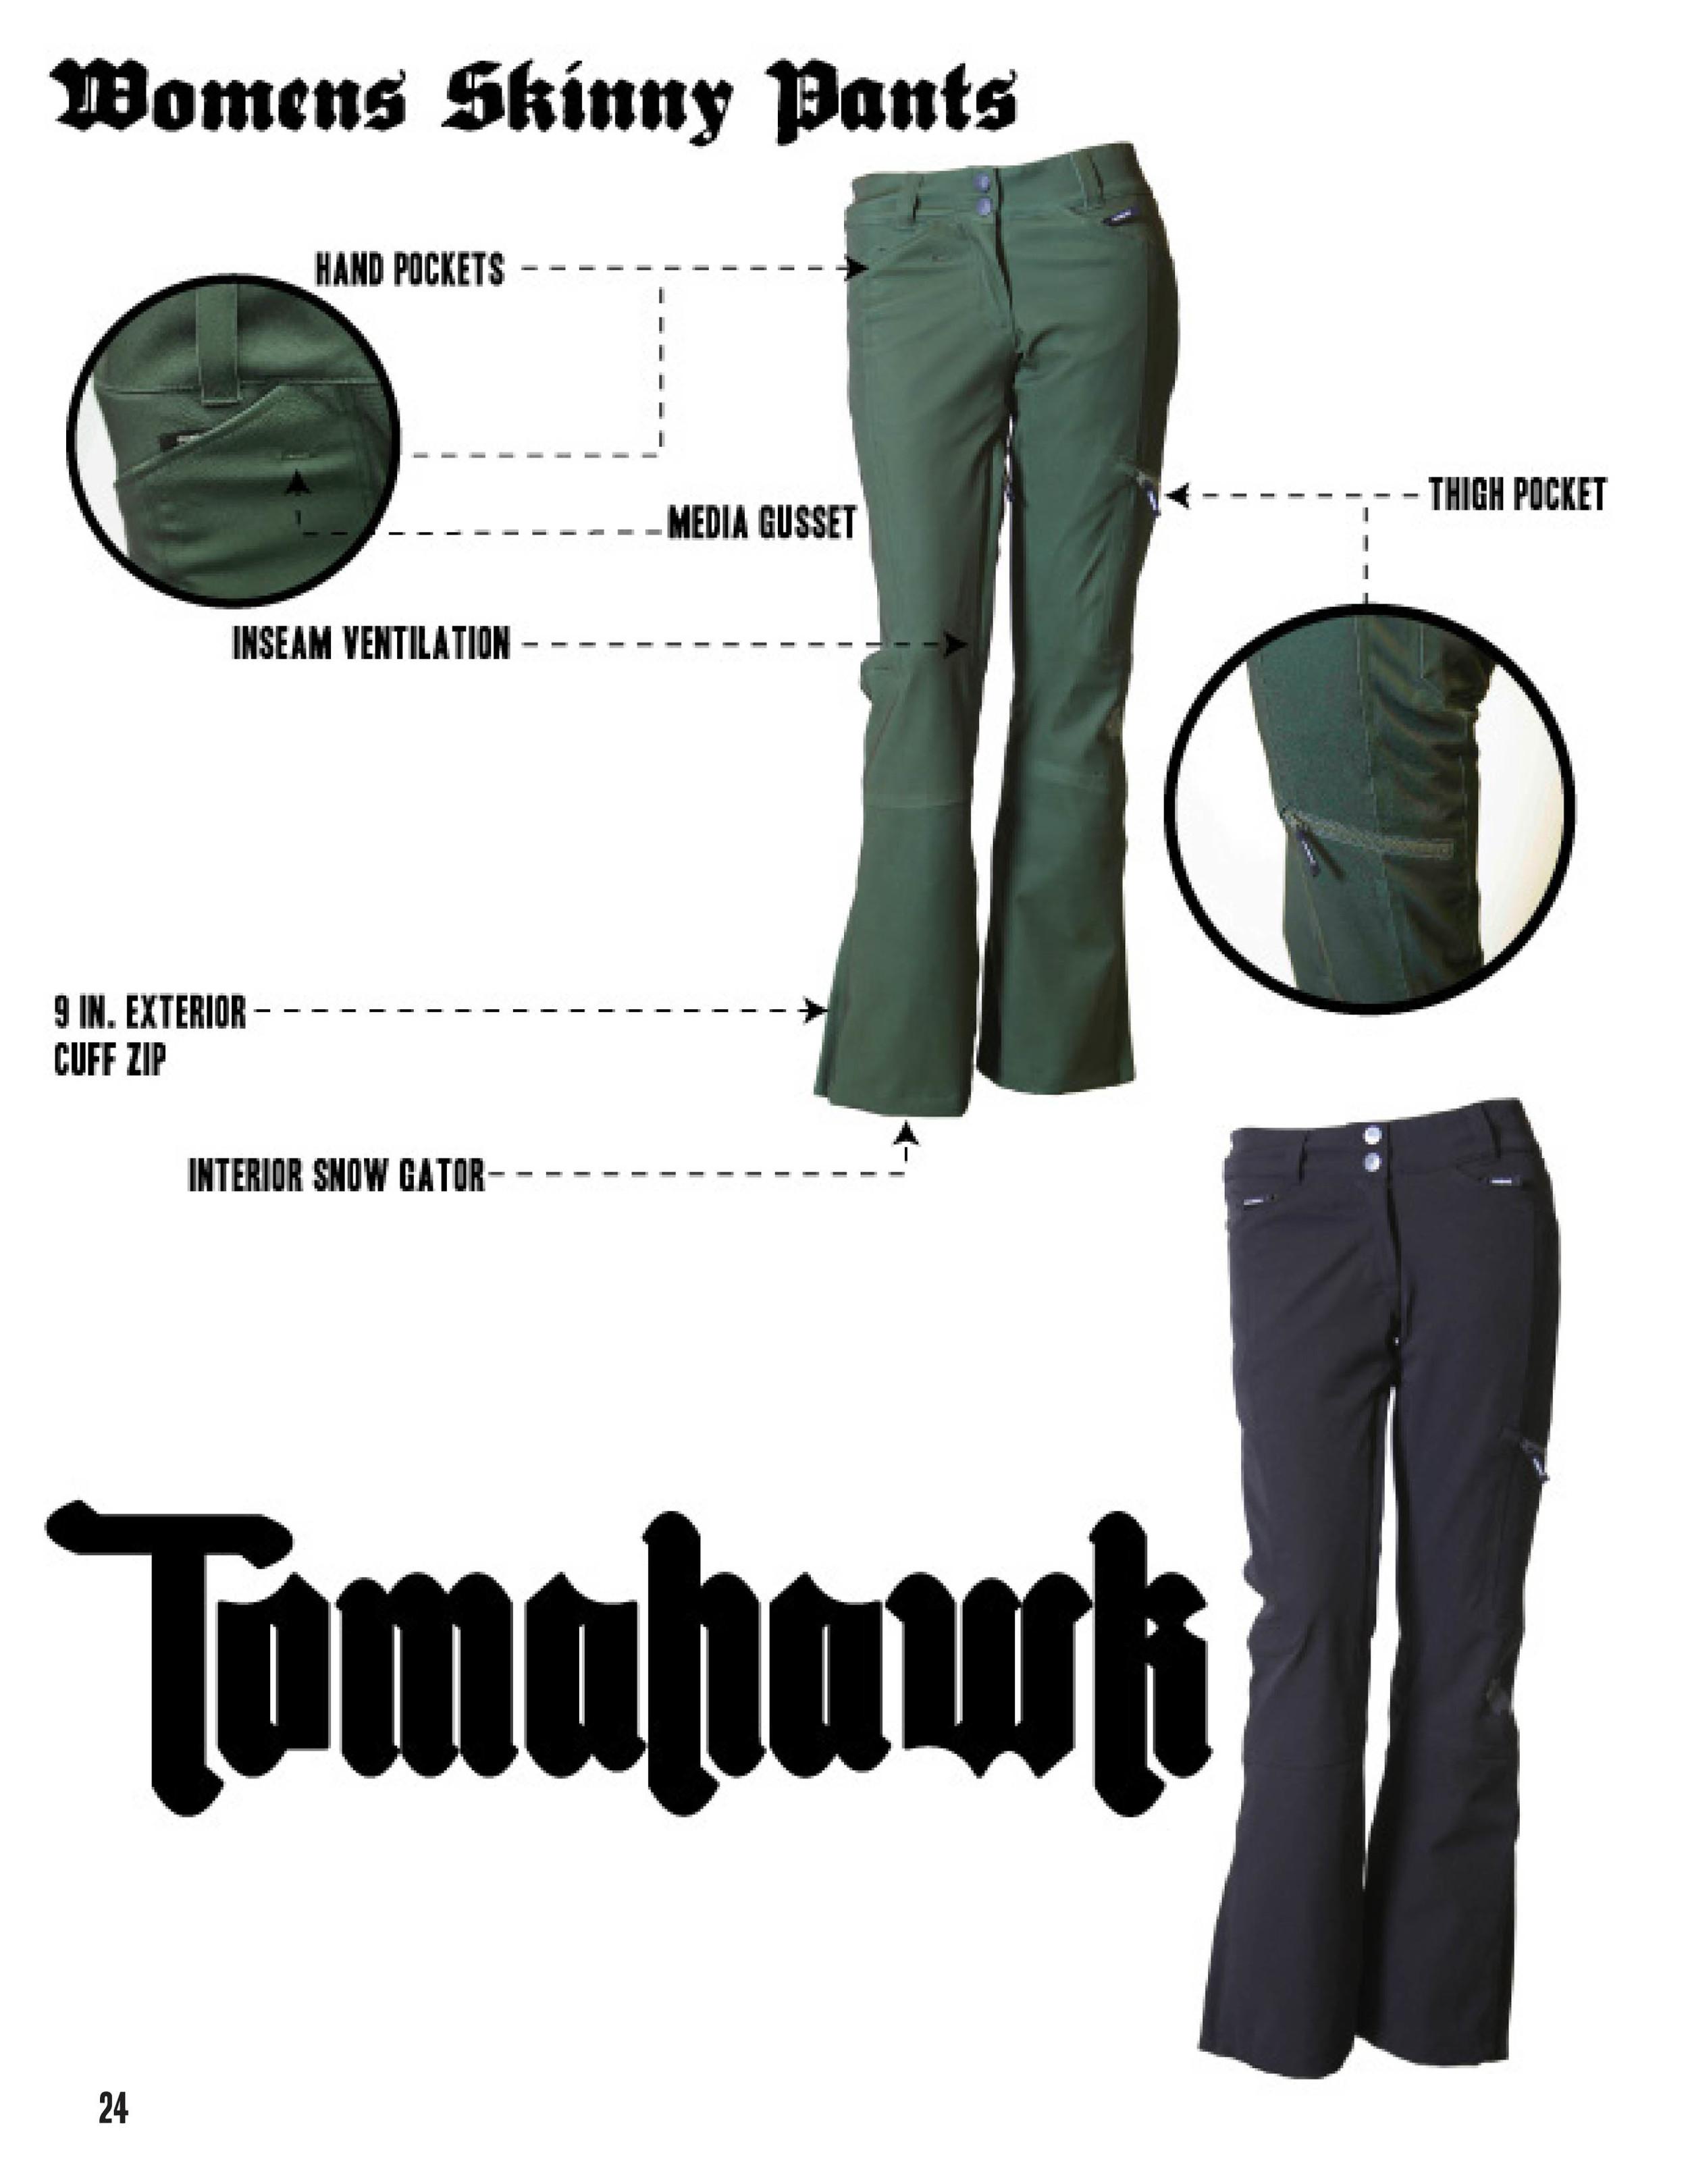 Tomahawk - Catalog Final 2016 (5)-24.jpg